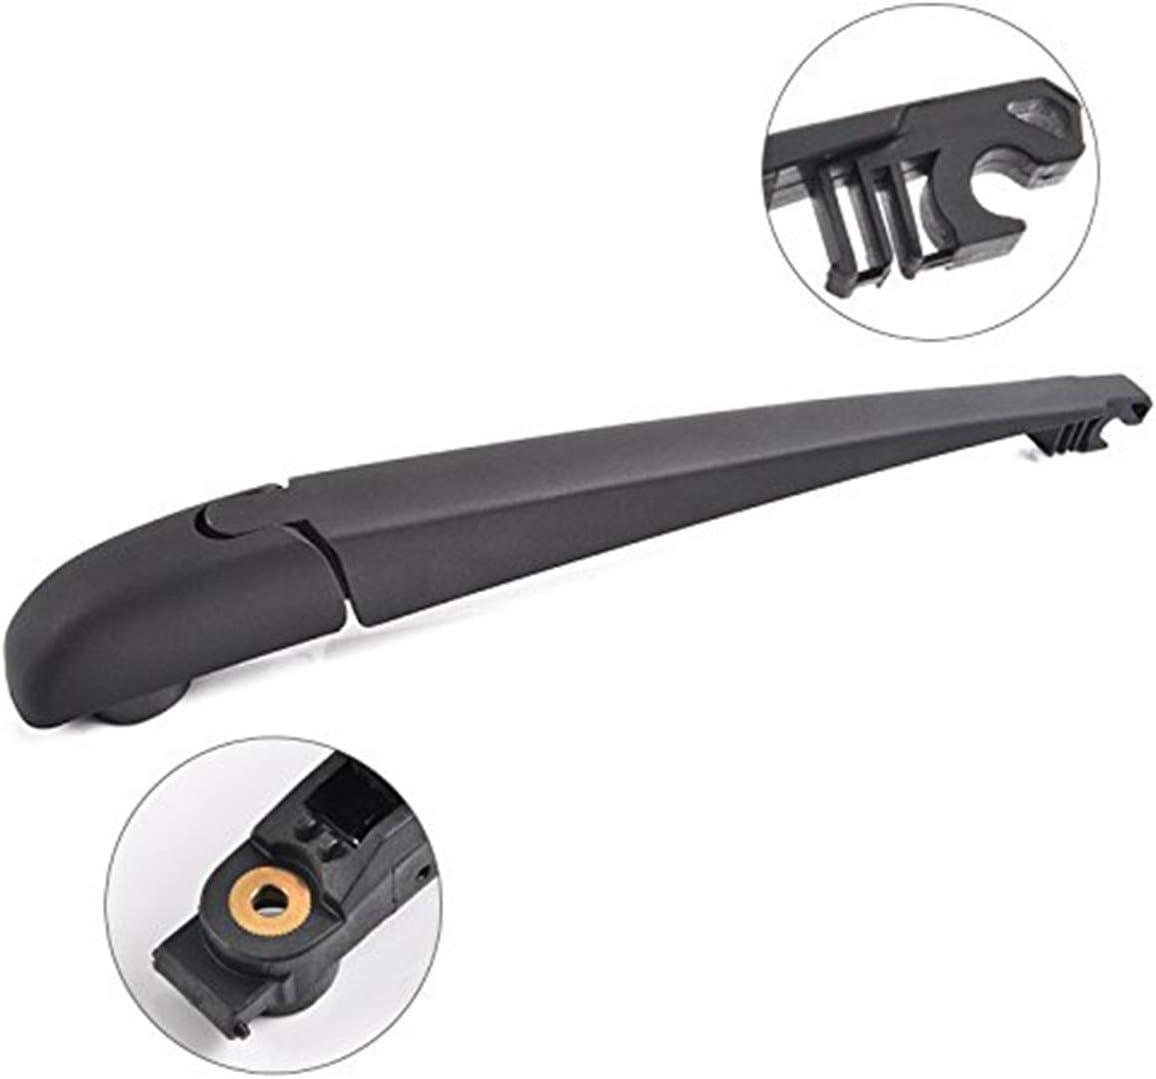 Rear Windshield Wiper Arm Blade Kit for Jeep Grand Cherokee 2011 2012 2013 2014 2015 Replace OE 68079868AA